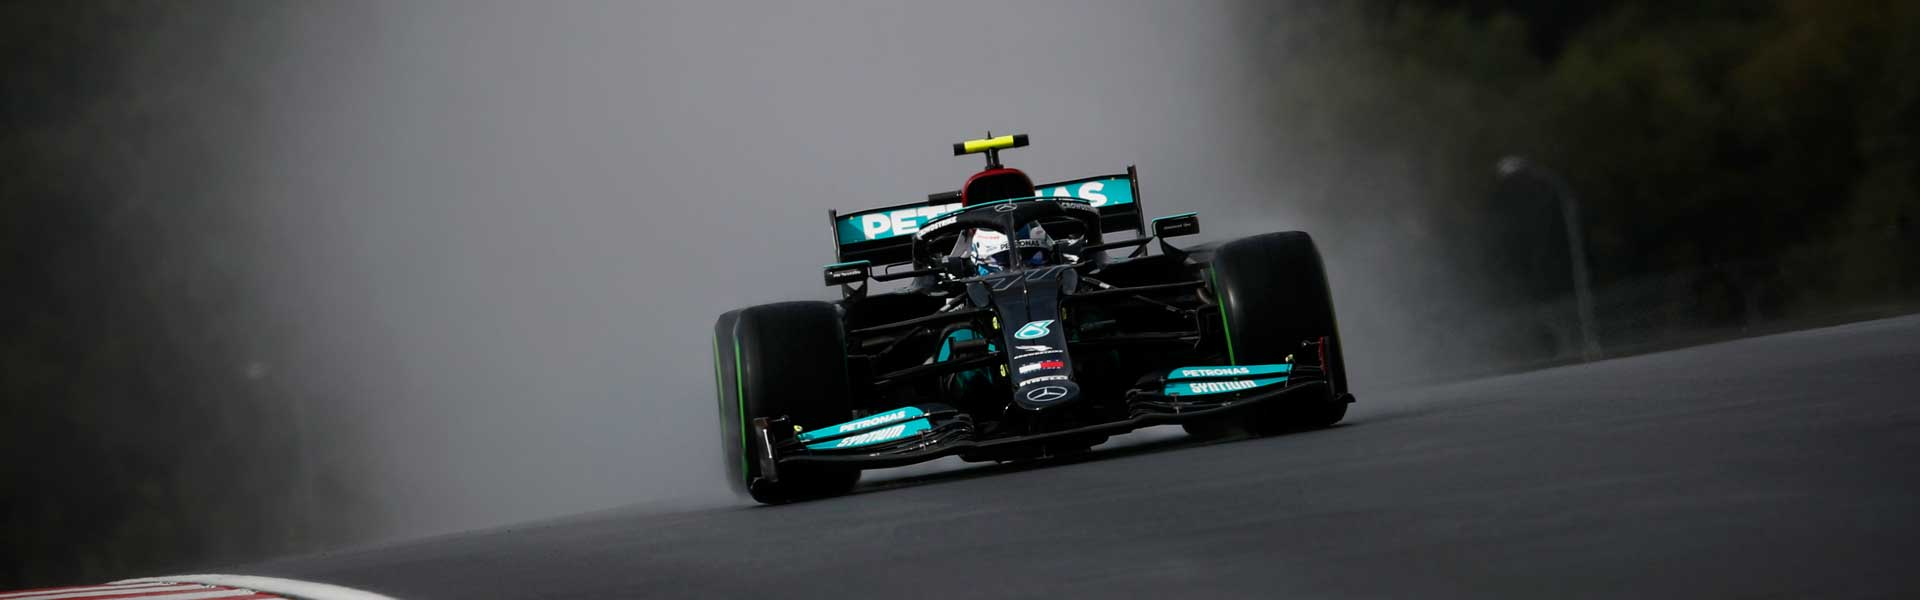 Valtteri Bottas wins the Turkish Grand Prix!